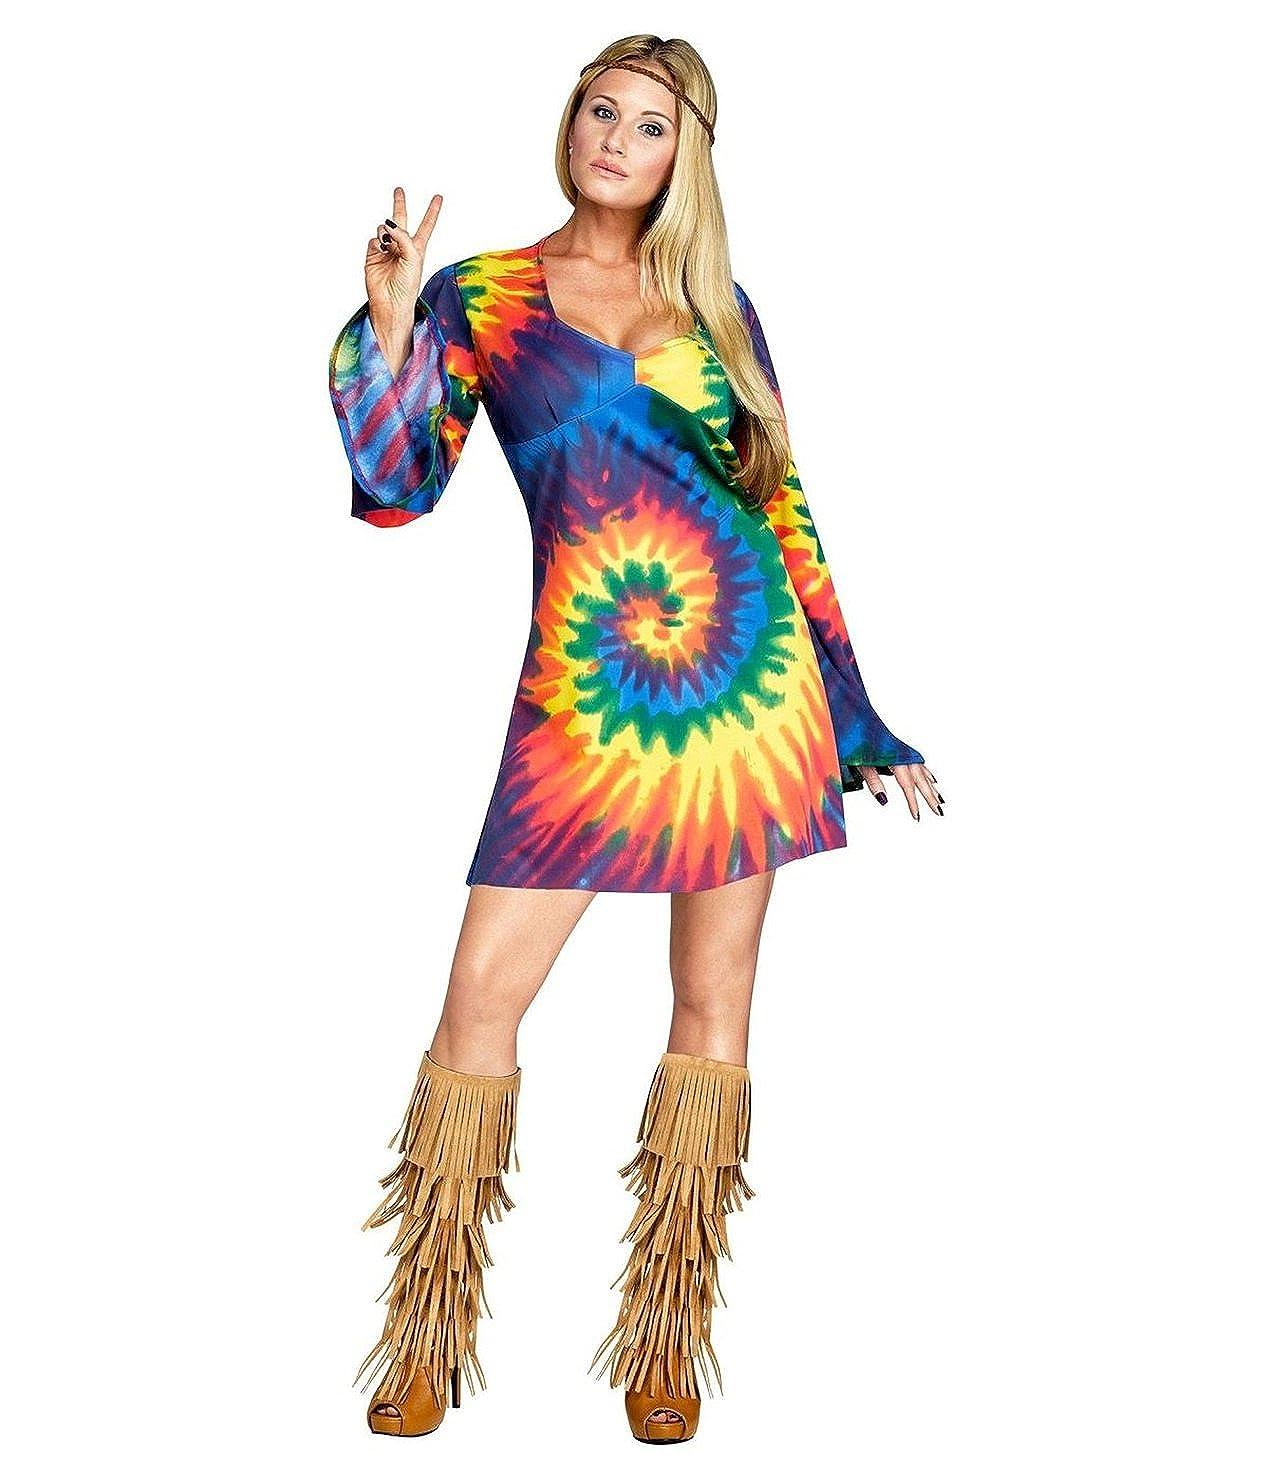 Amazon.com Fun World Womens Groovy Gal Halloween Party Hippie Costume Clothing  sc 1 st  Amazon.com & Amazon.com: Fun World Womens Groovy Gal Halloween Party Hippie ...